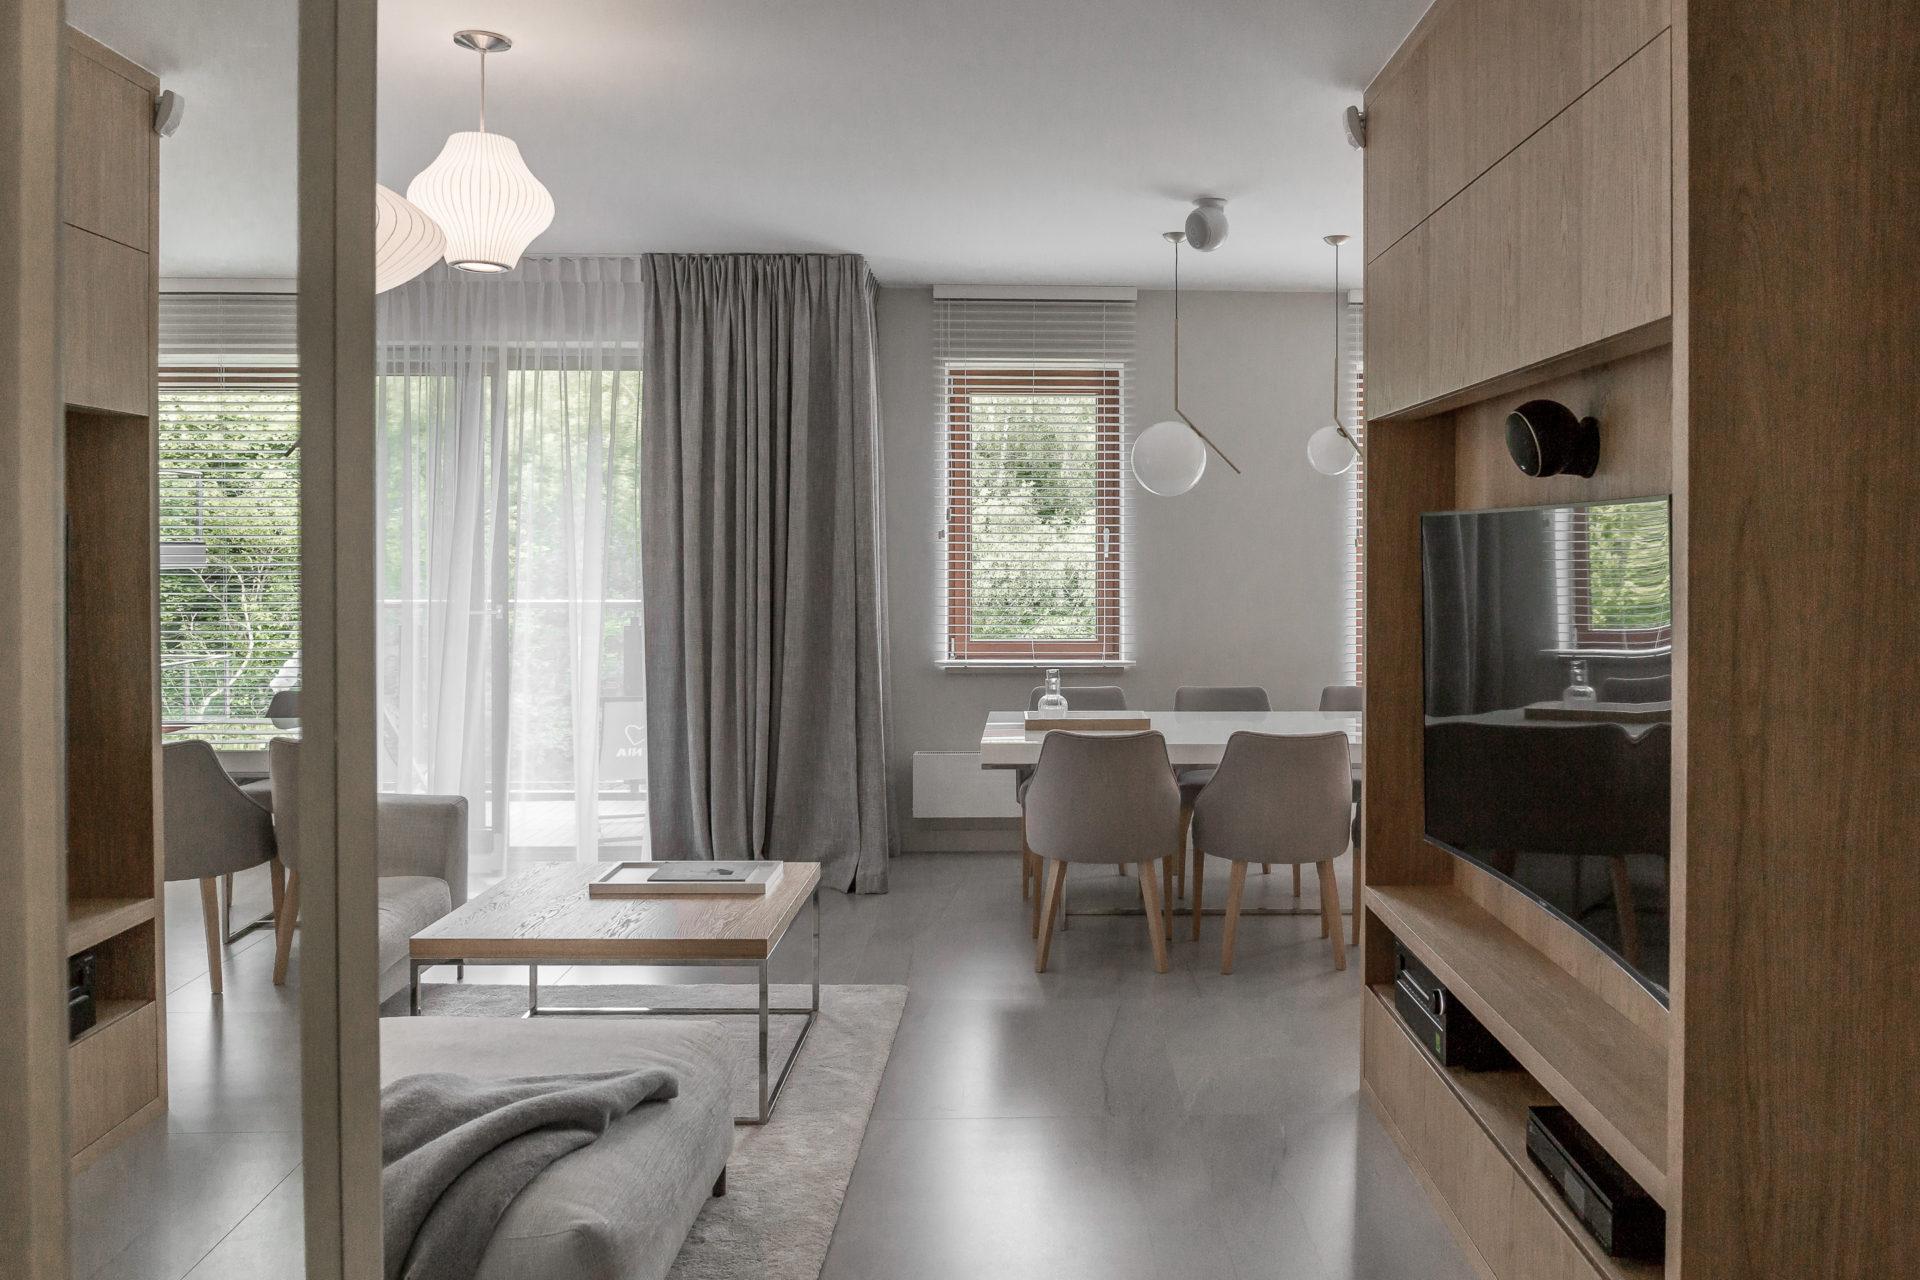 Apartament w Gdyni 2016 - 02 P